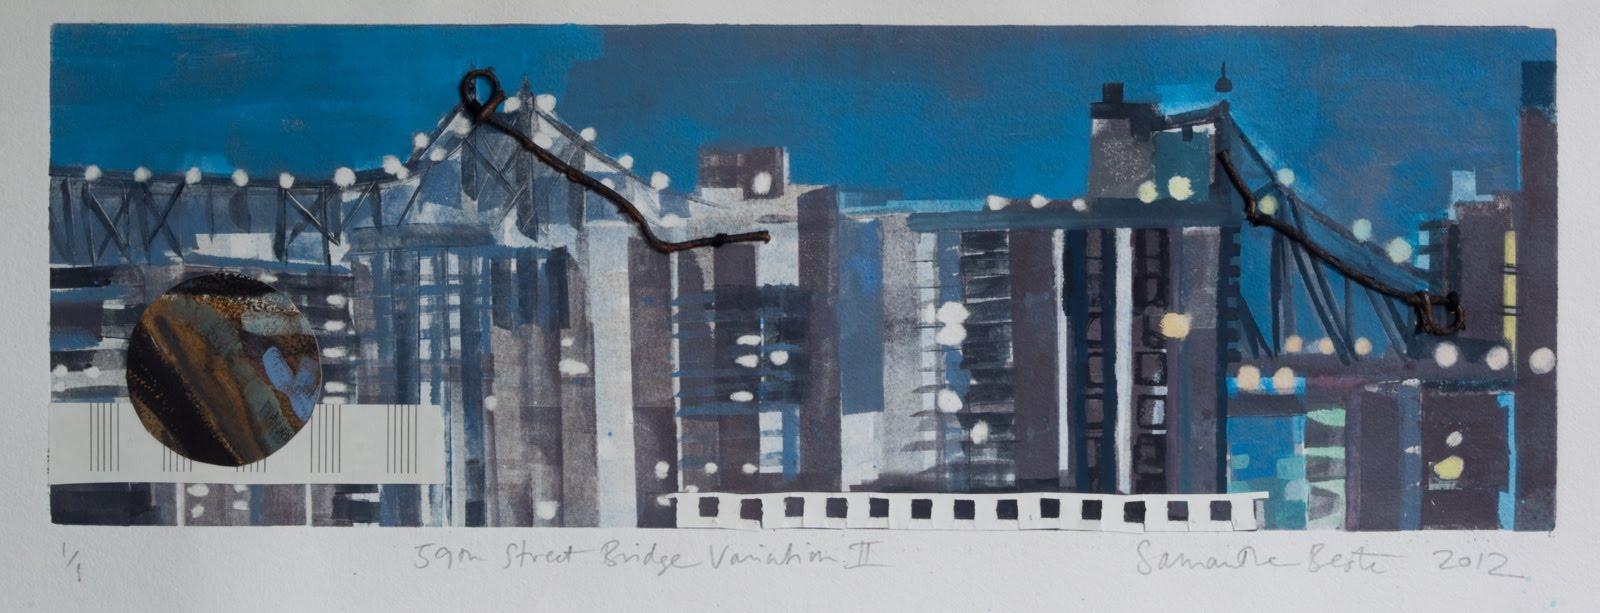 """59th Street Bridge Variation II"", monotype/collage, 12x24 in."